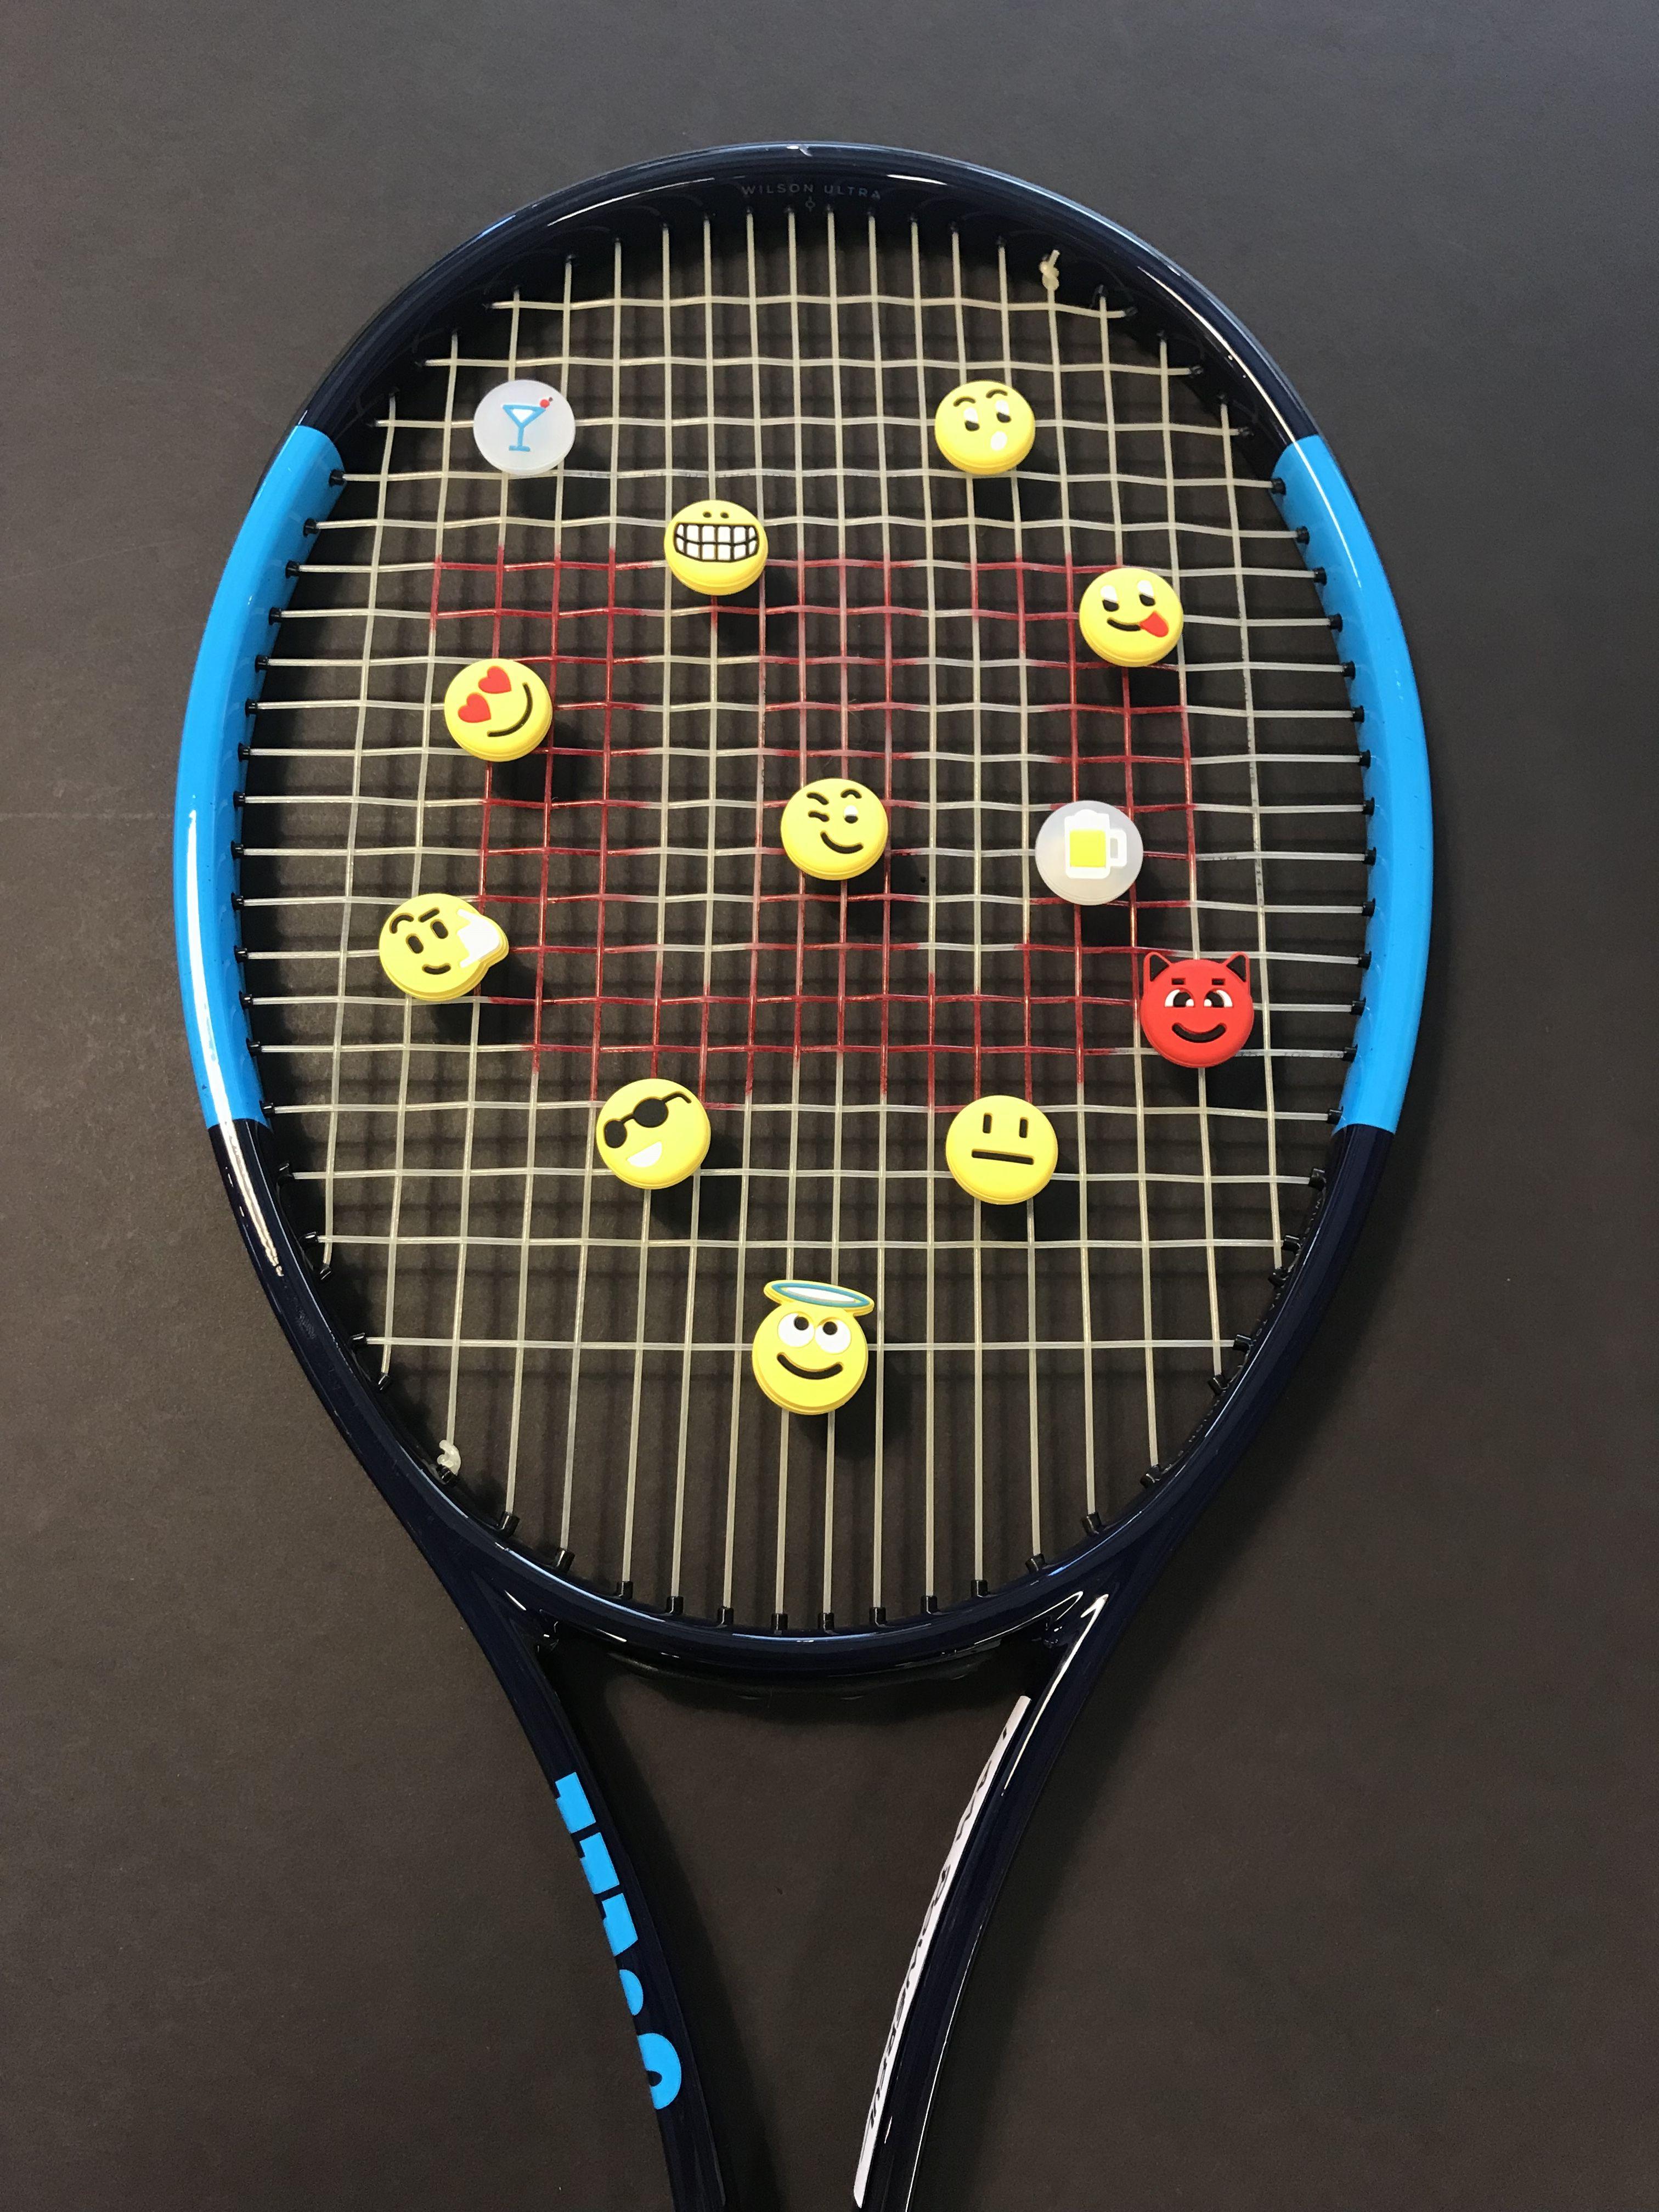 Emoji Vibration Dampeners Spring Camping Colorado Springs Camping Tennis Racket